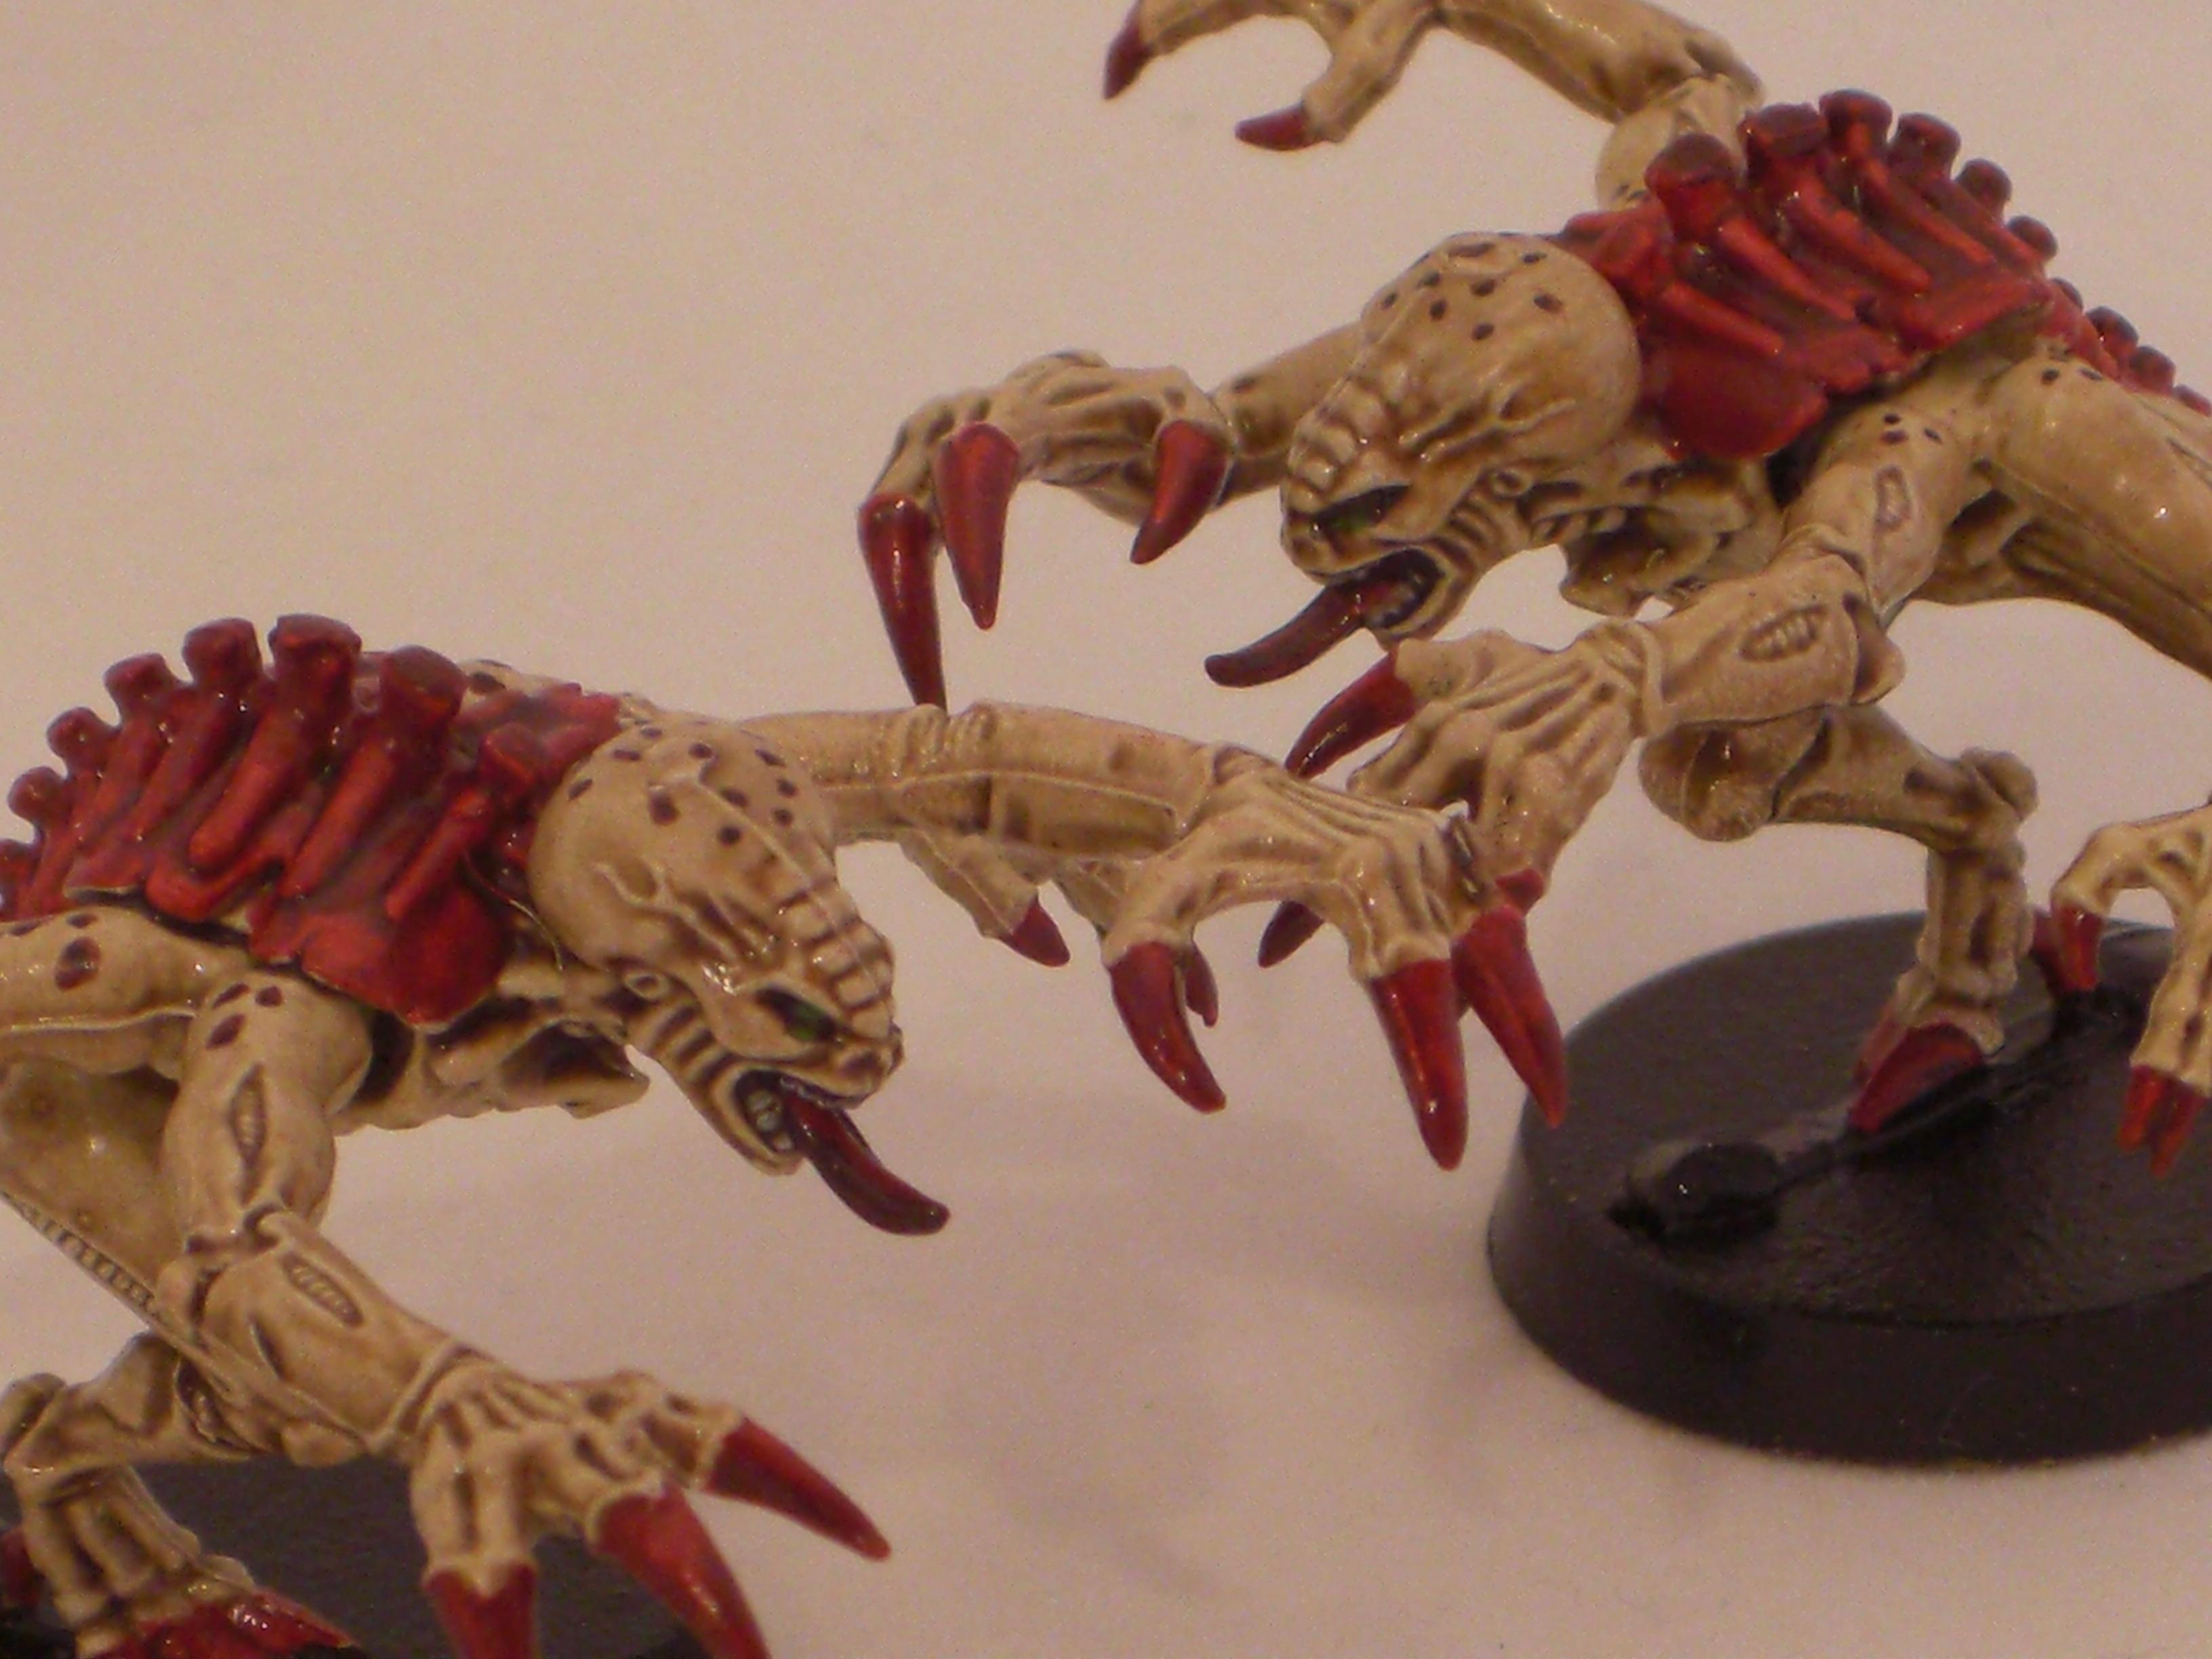 Dipped, Genestealer, Tyranids, Warhammer 40,000